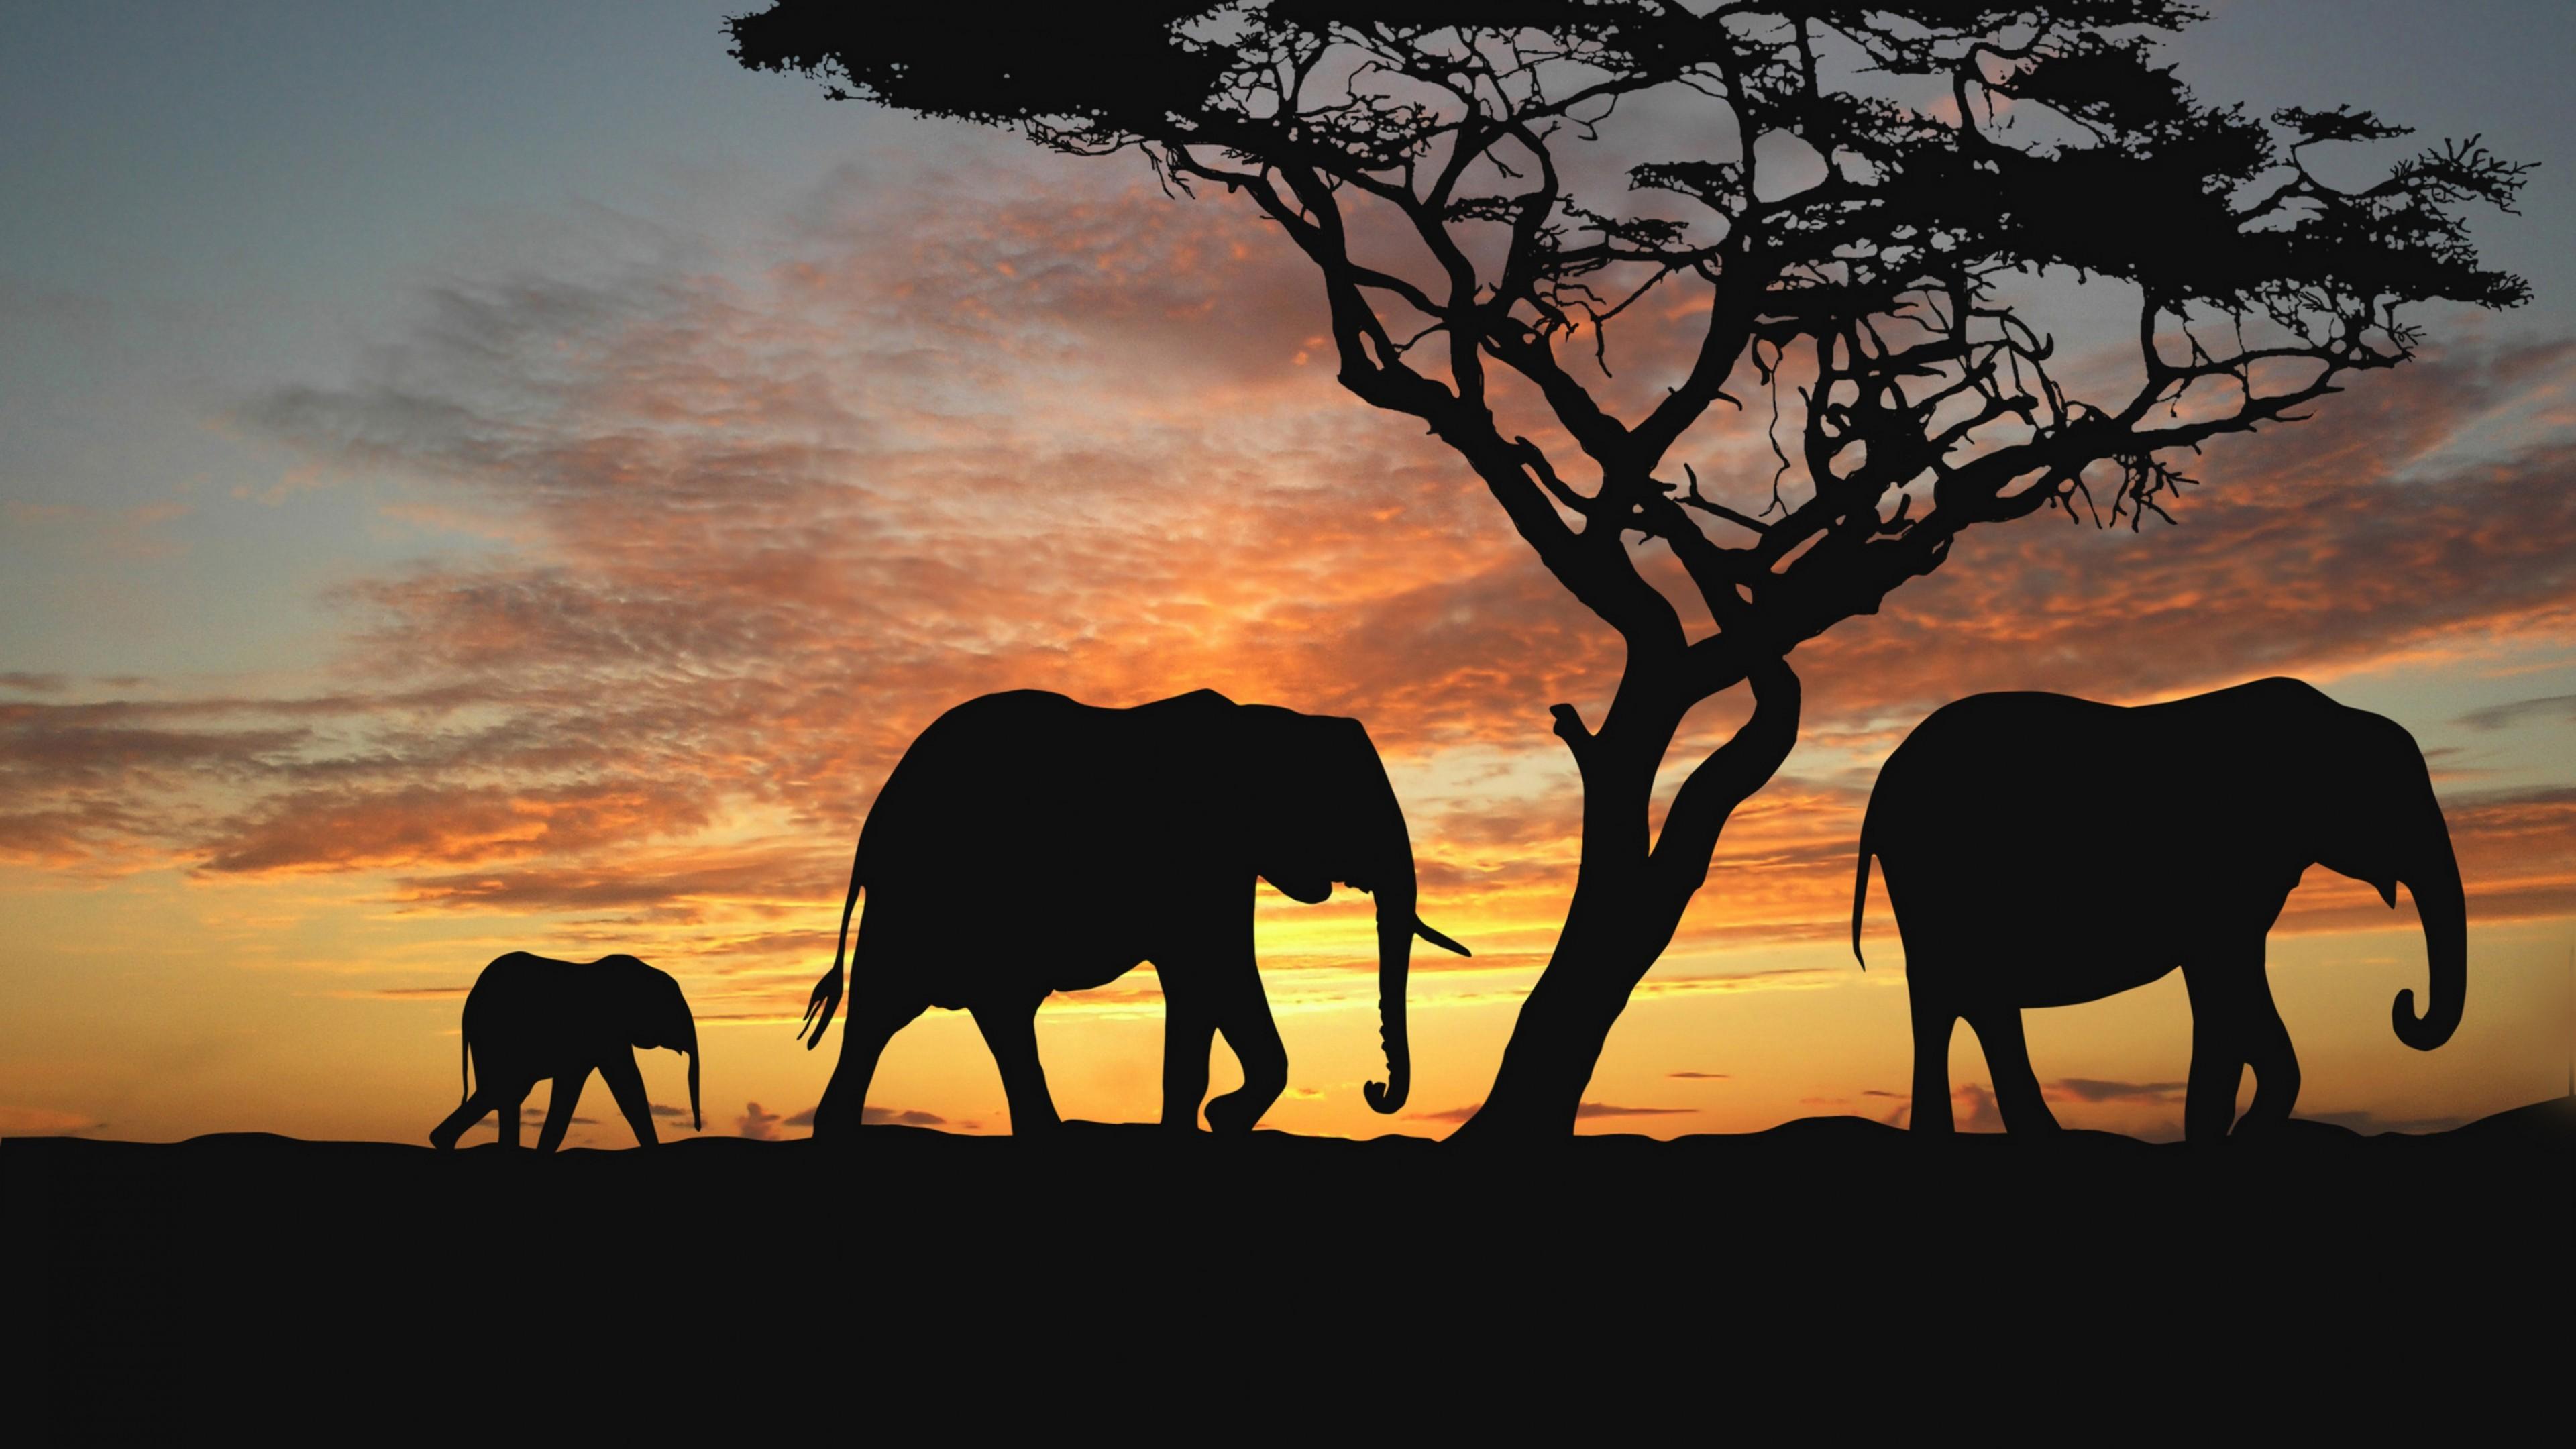 1920x1200 Wallpaperwiki Elephant Animal Wallpaper PIC WPD007135